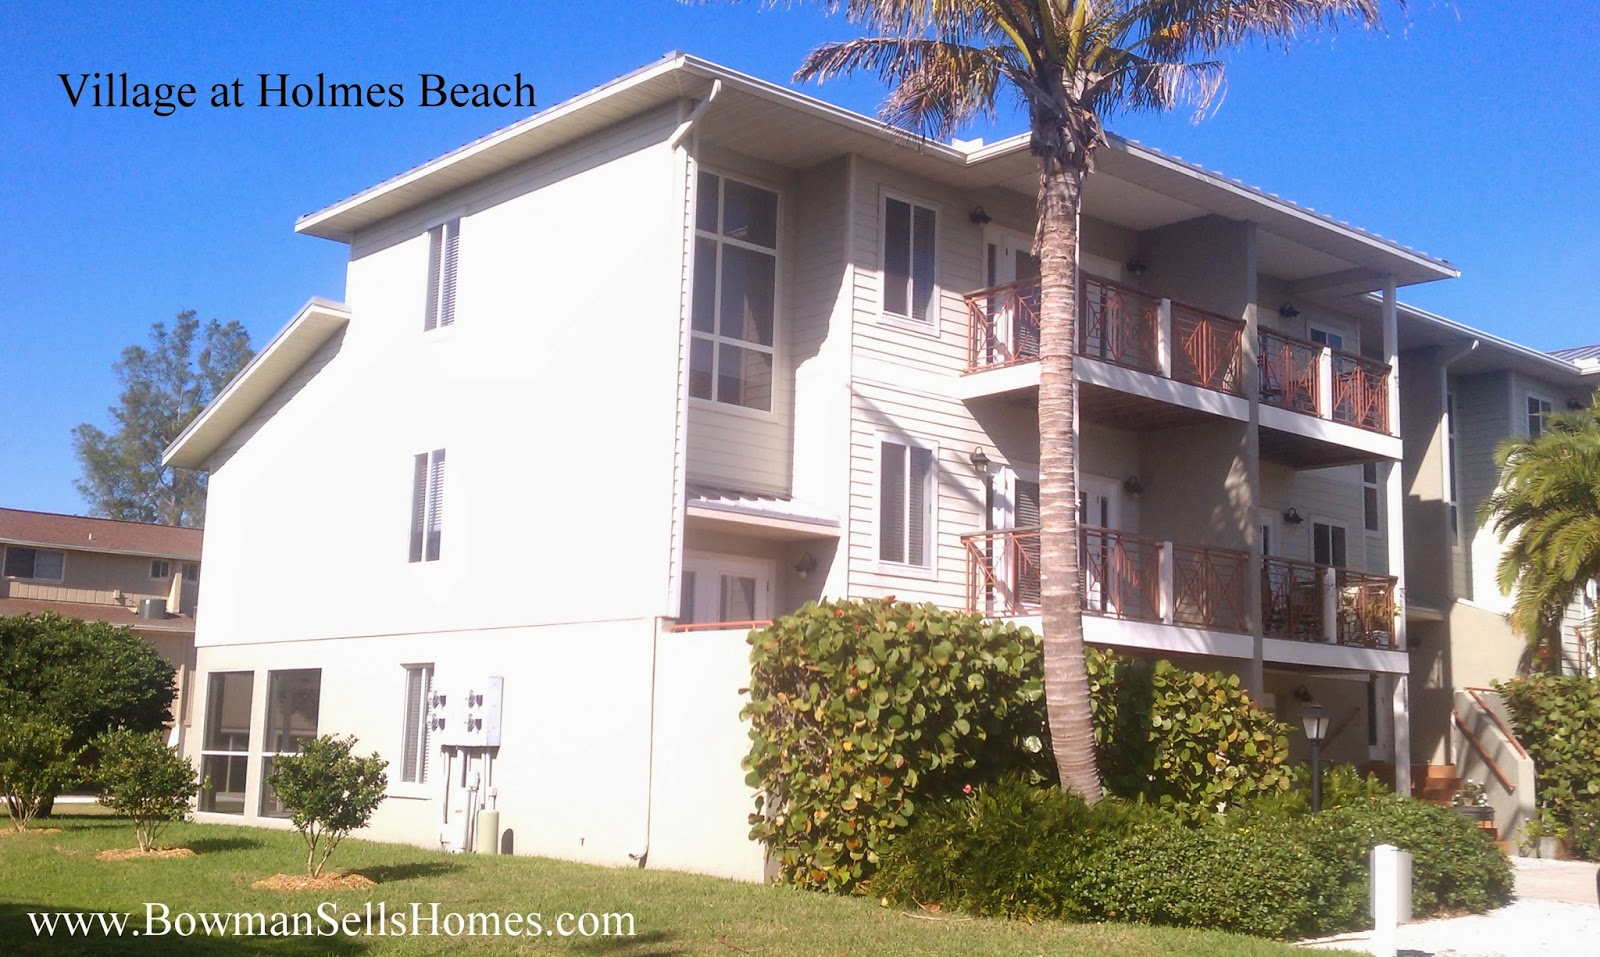 Holmes Beach - Village at Holmes Beach Real Estate Listings